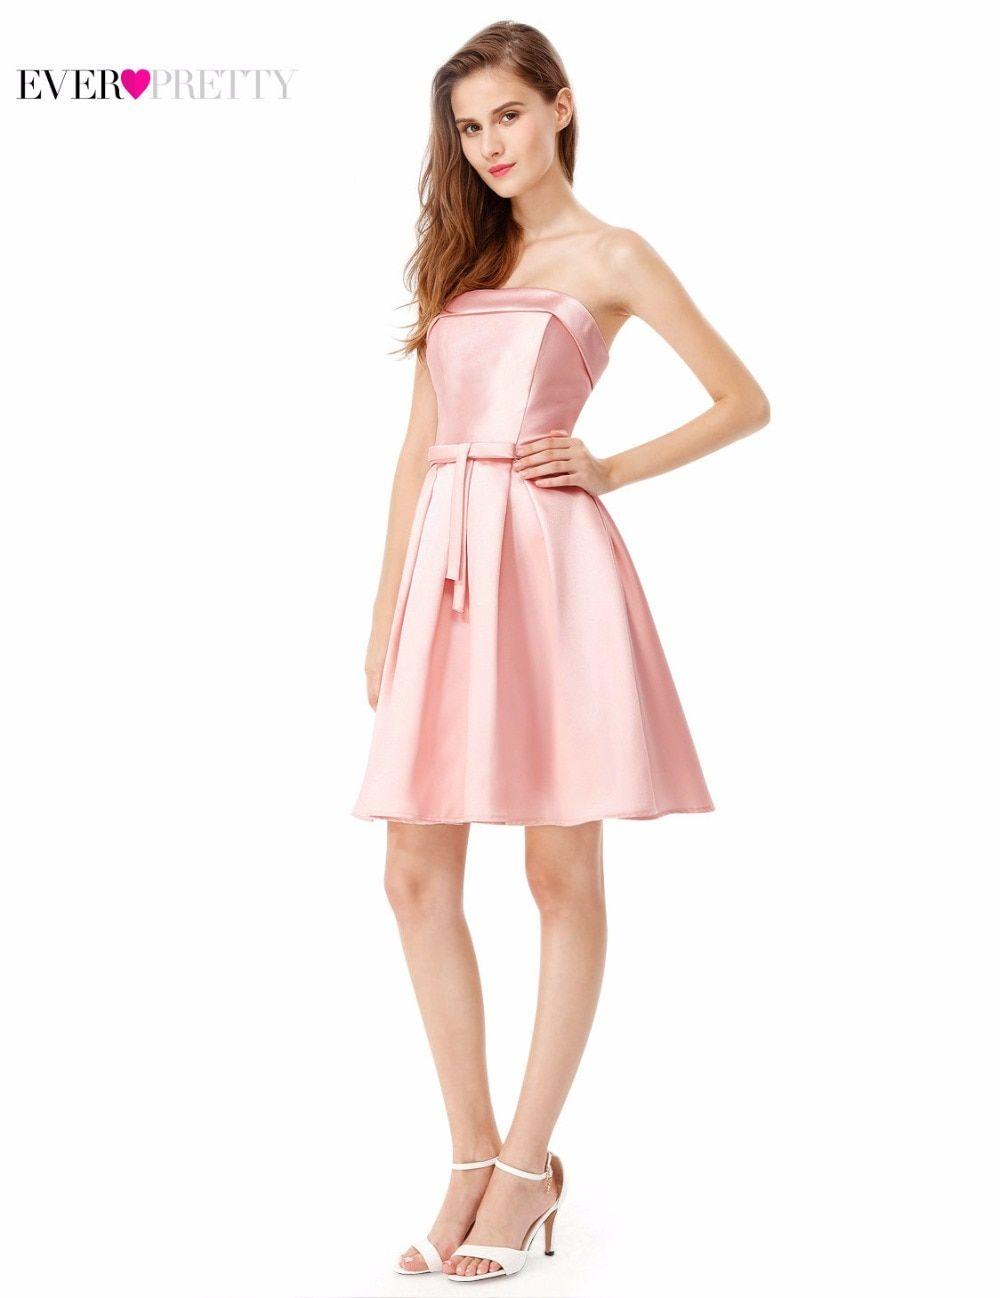 73eb1497d08e Cocktail Dress Ever Pretty EP05491PE Peach Elegant High Neck Sleeveless  Short Sexy V-Neck Back Cocktail Dress 2017 - TakoFashion - Women's Clothing  ...